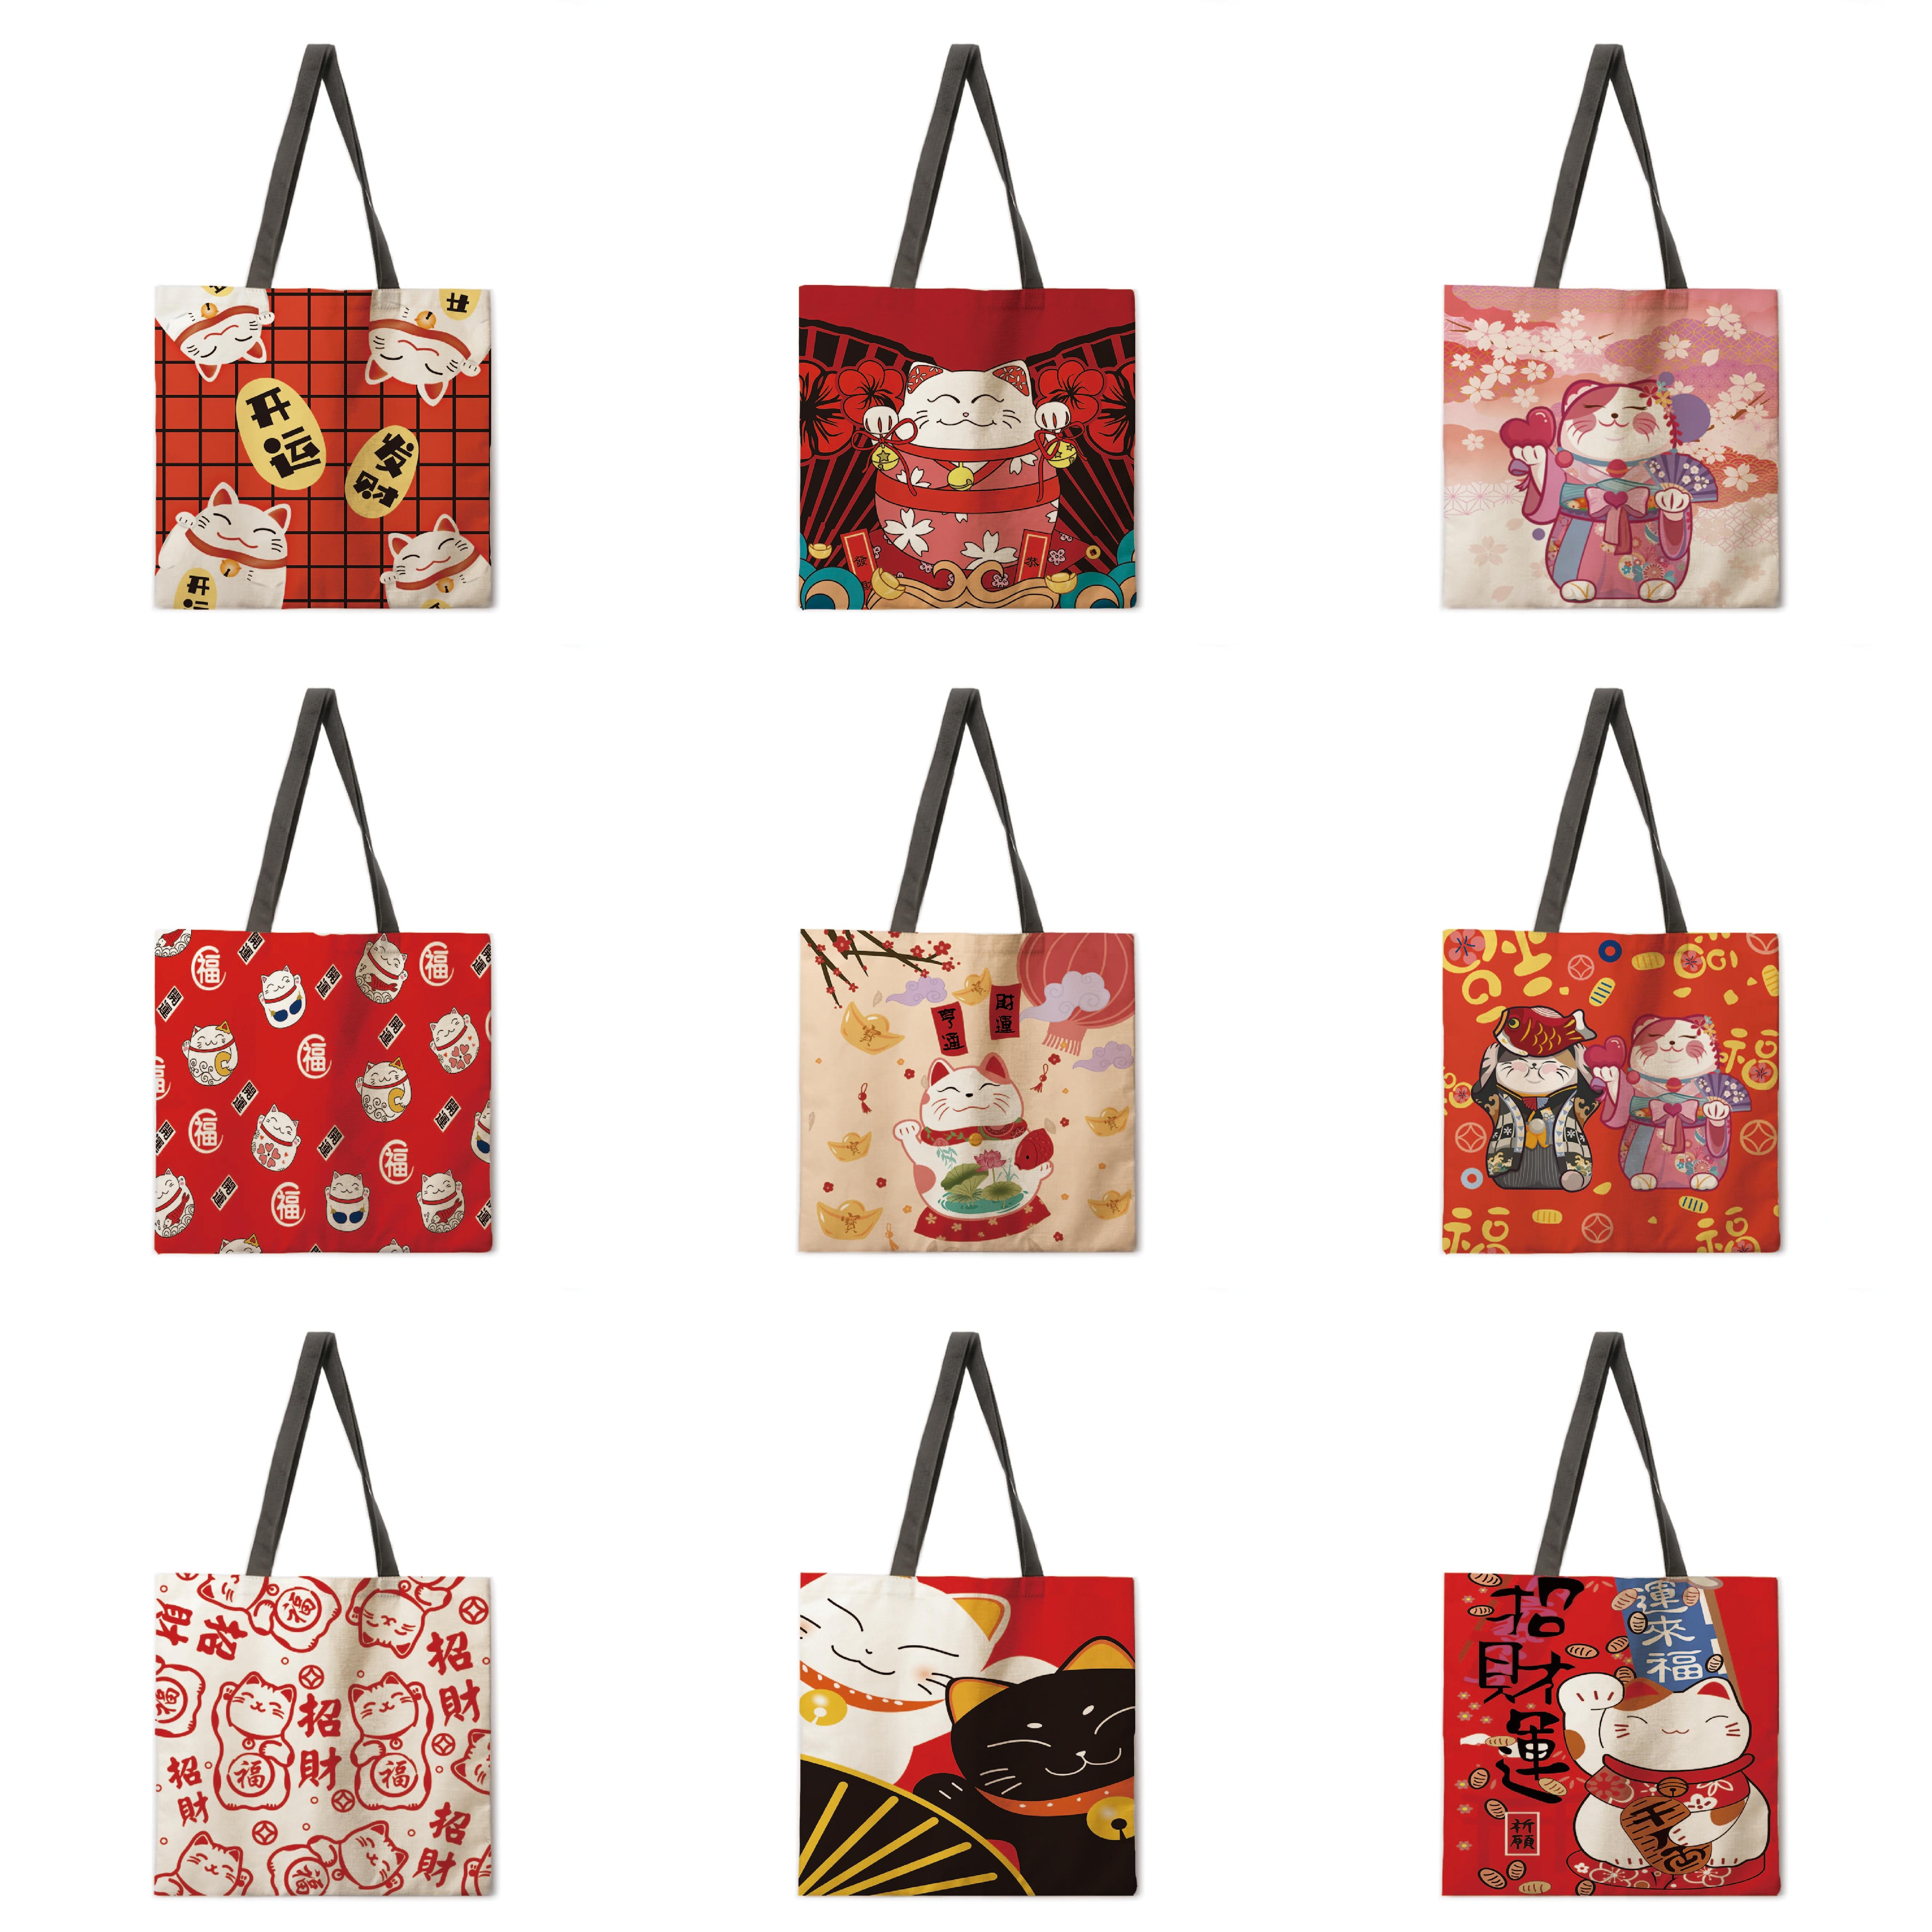 AliExpress - Women's Beach Bag Foldable Shoulder Bag Shopping Bag Lucky Cat Print Tote Bag Linen Casual Tote Bag Reusable